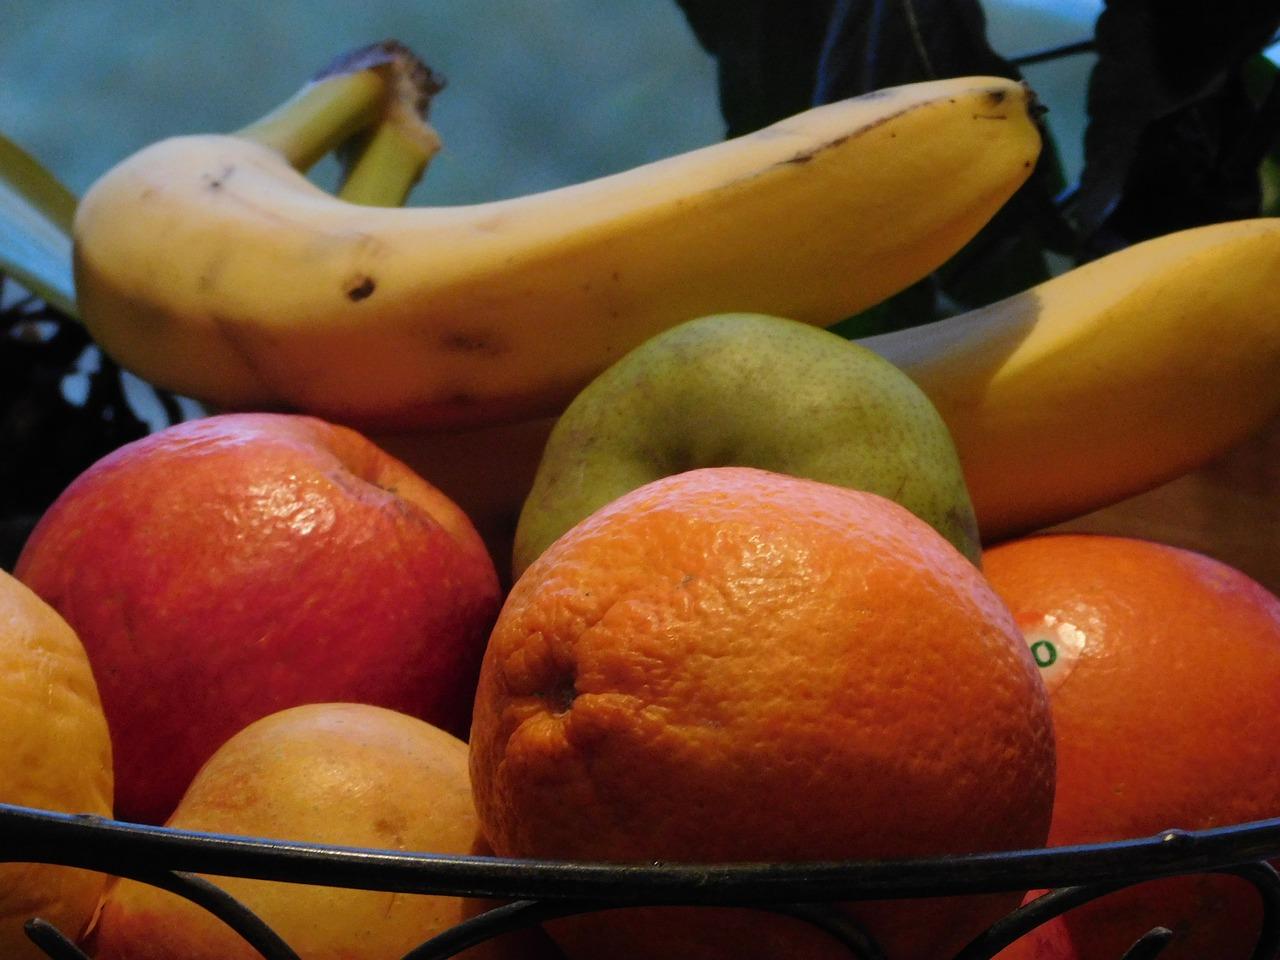 картинка яблоко банан апельсин представляет собой